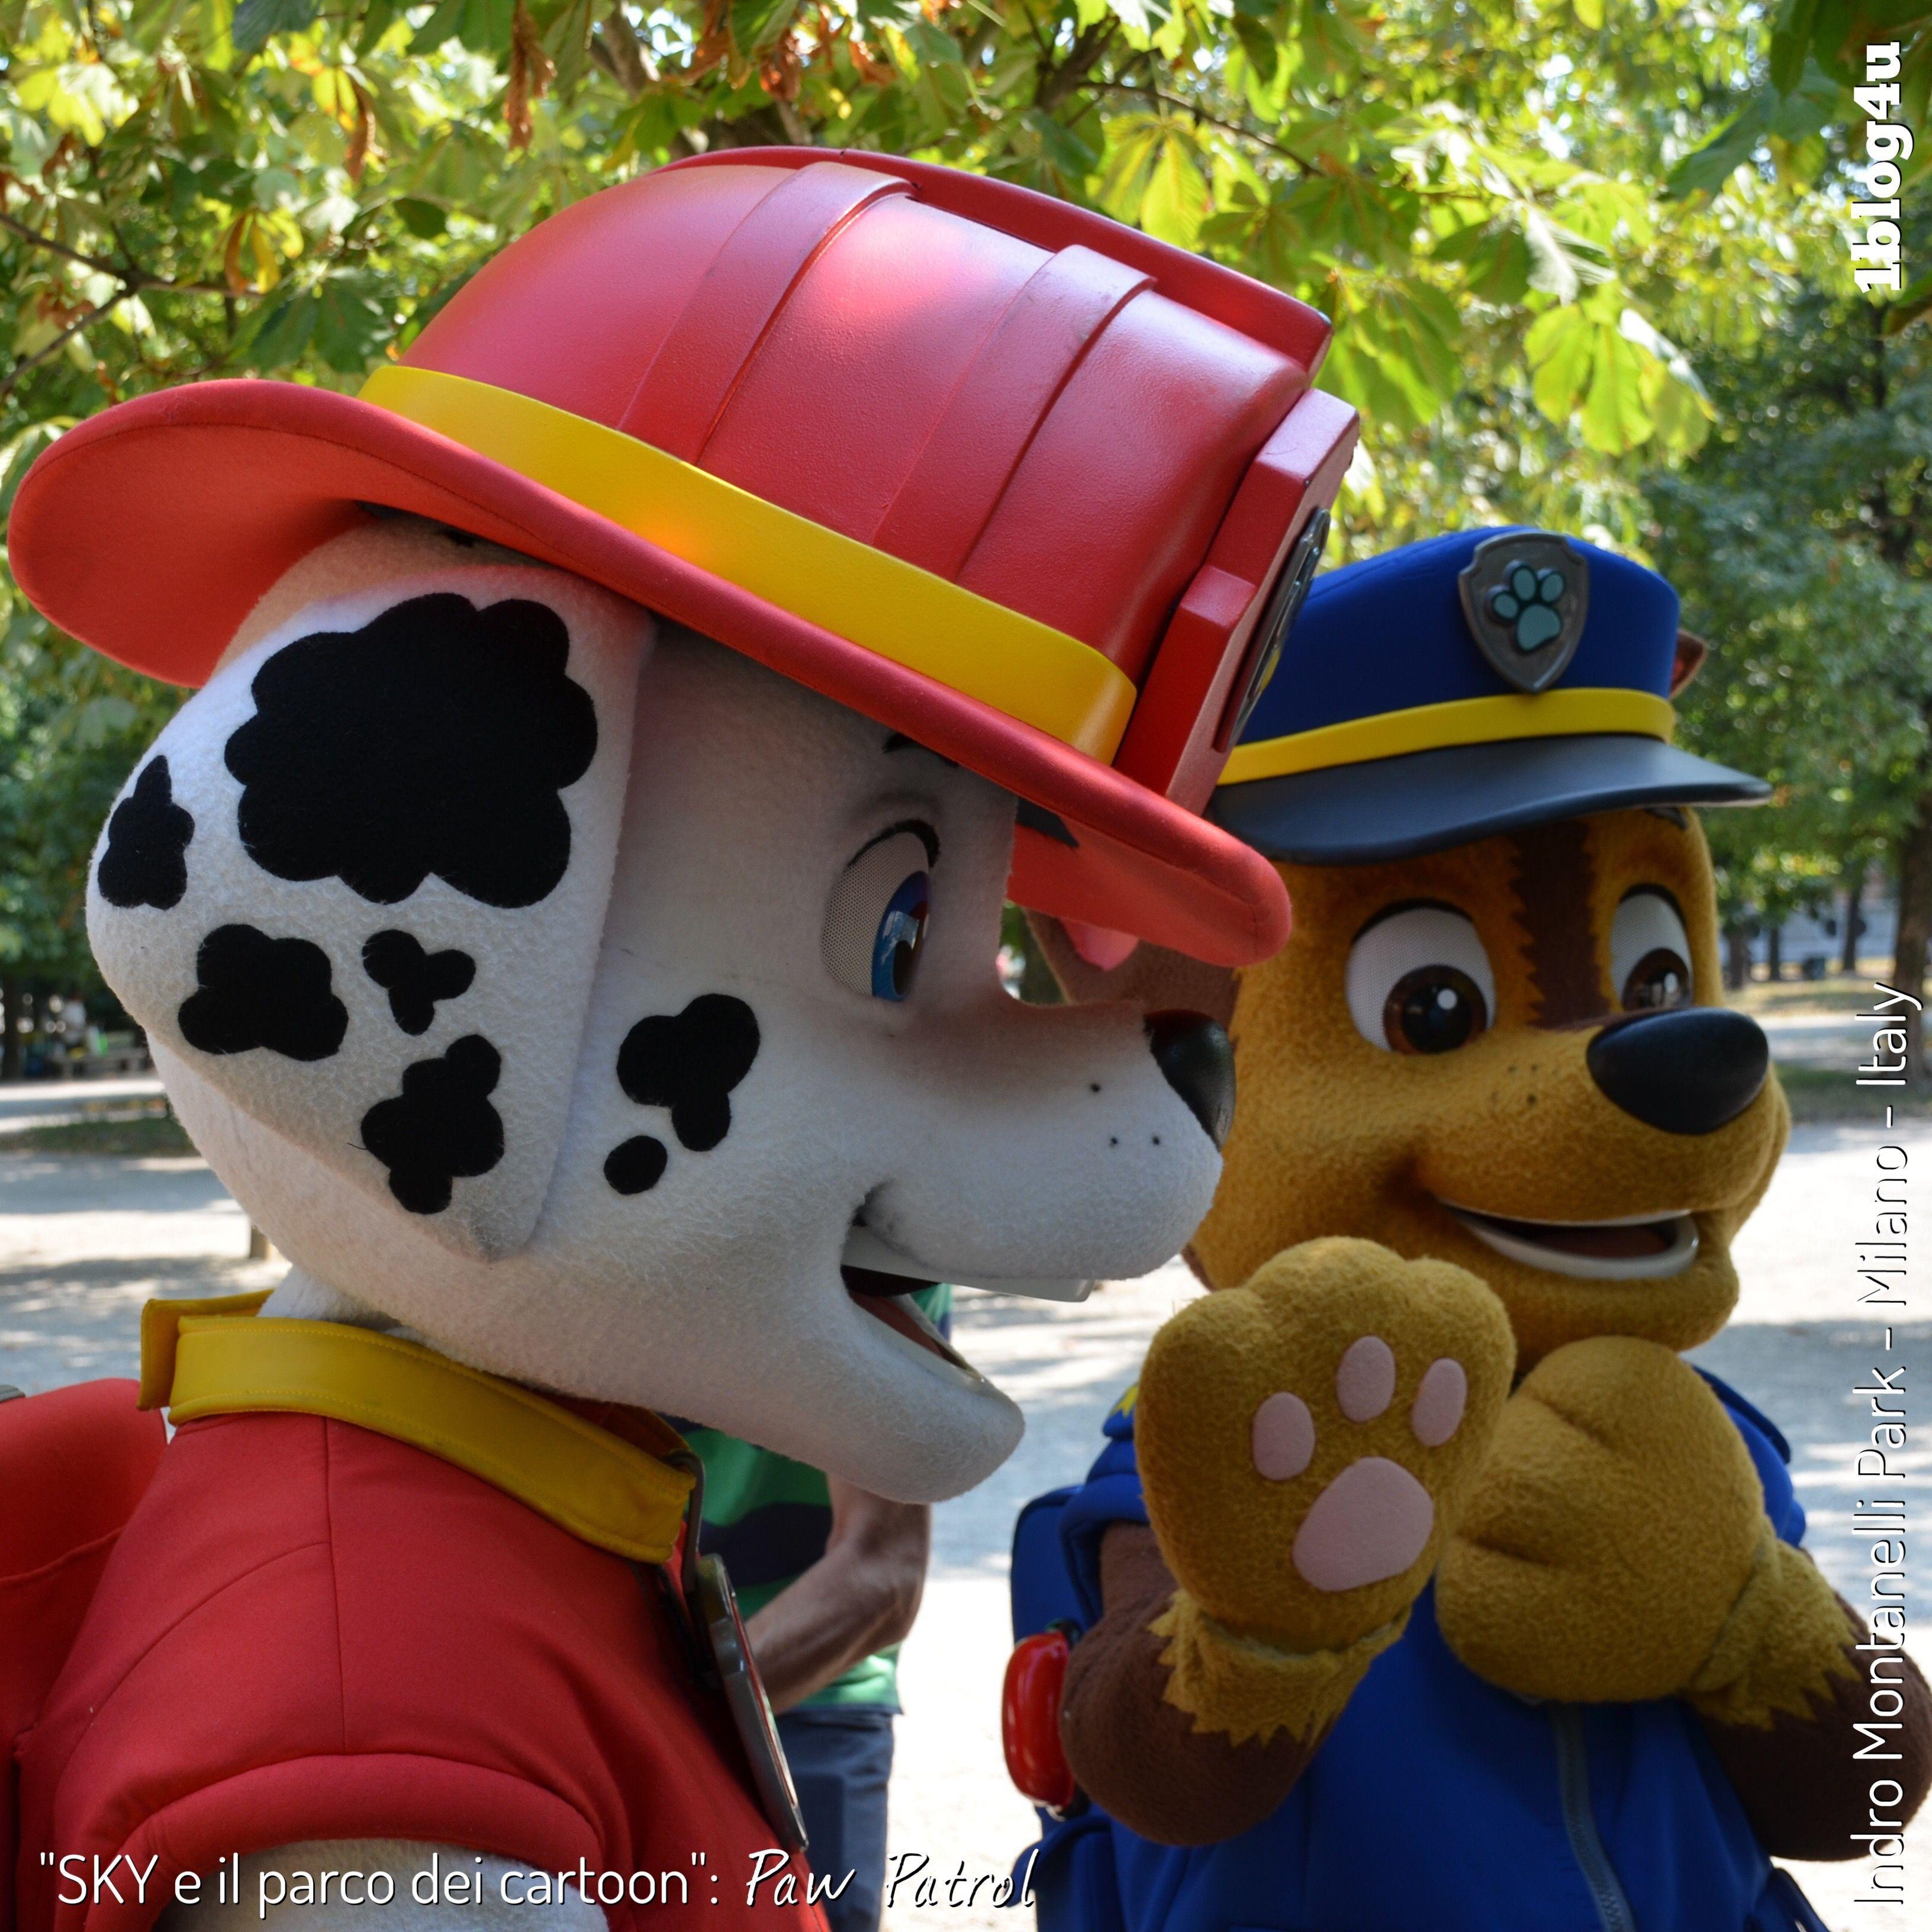 SKY e il parco dei cartoon Paw Patrol Marshall